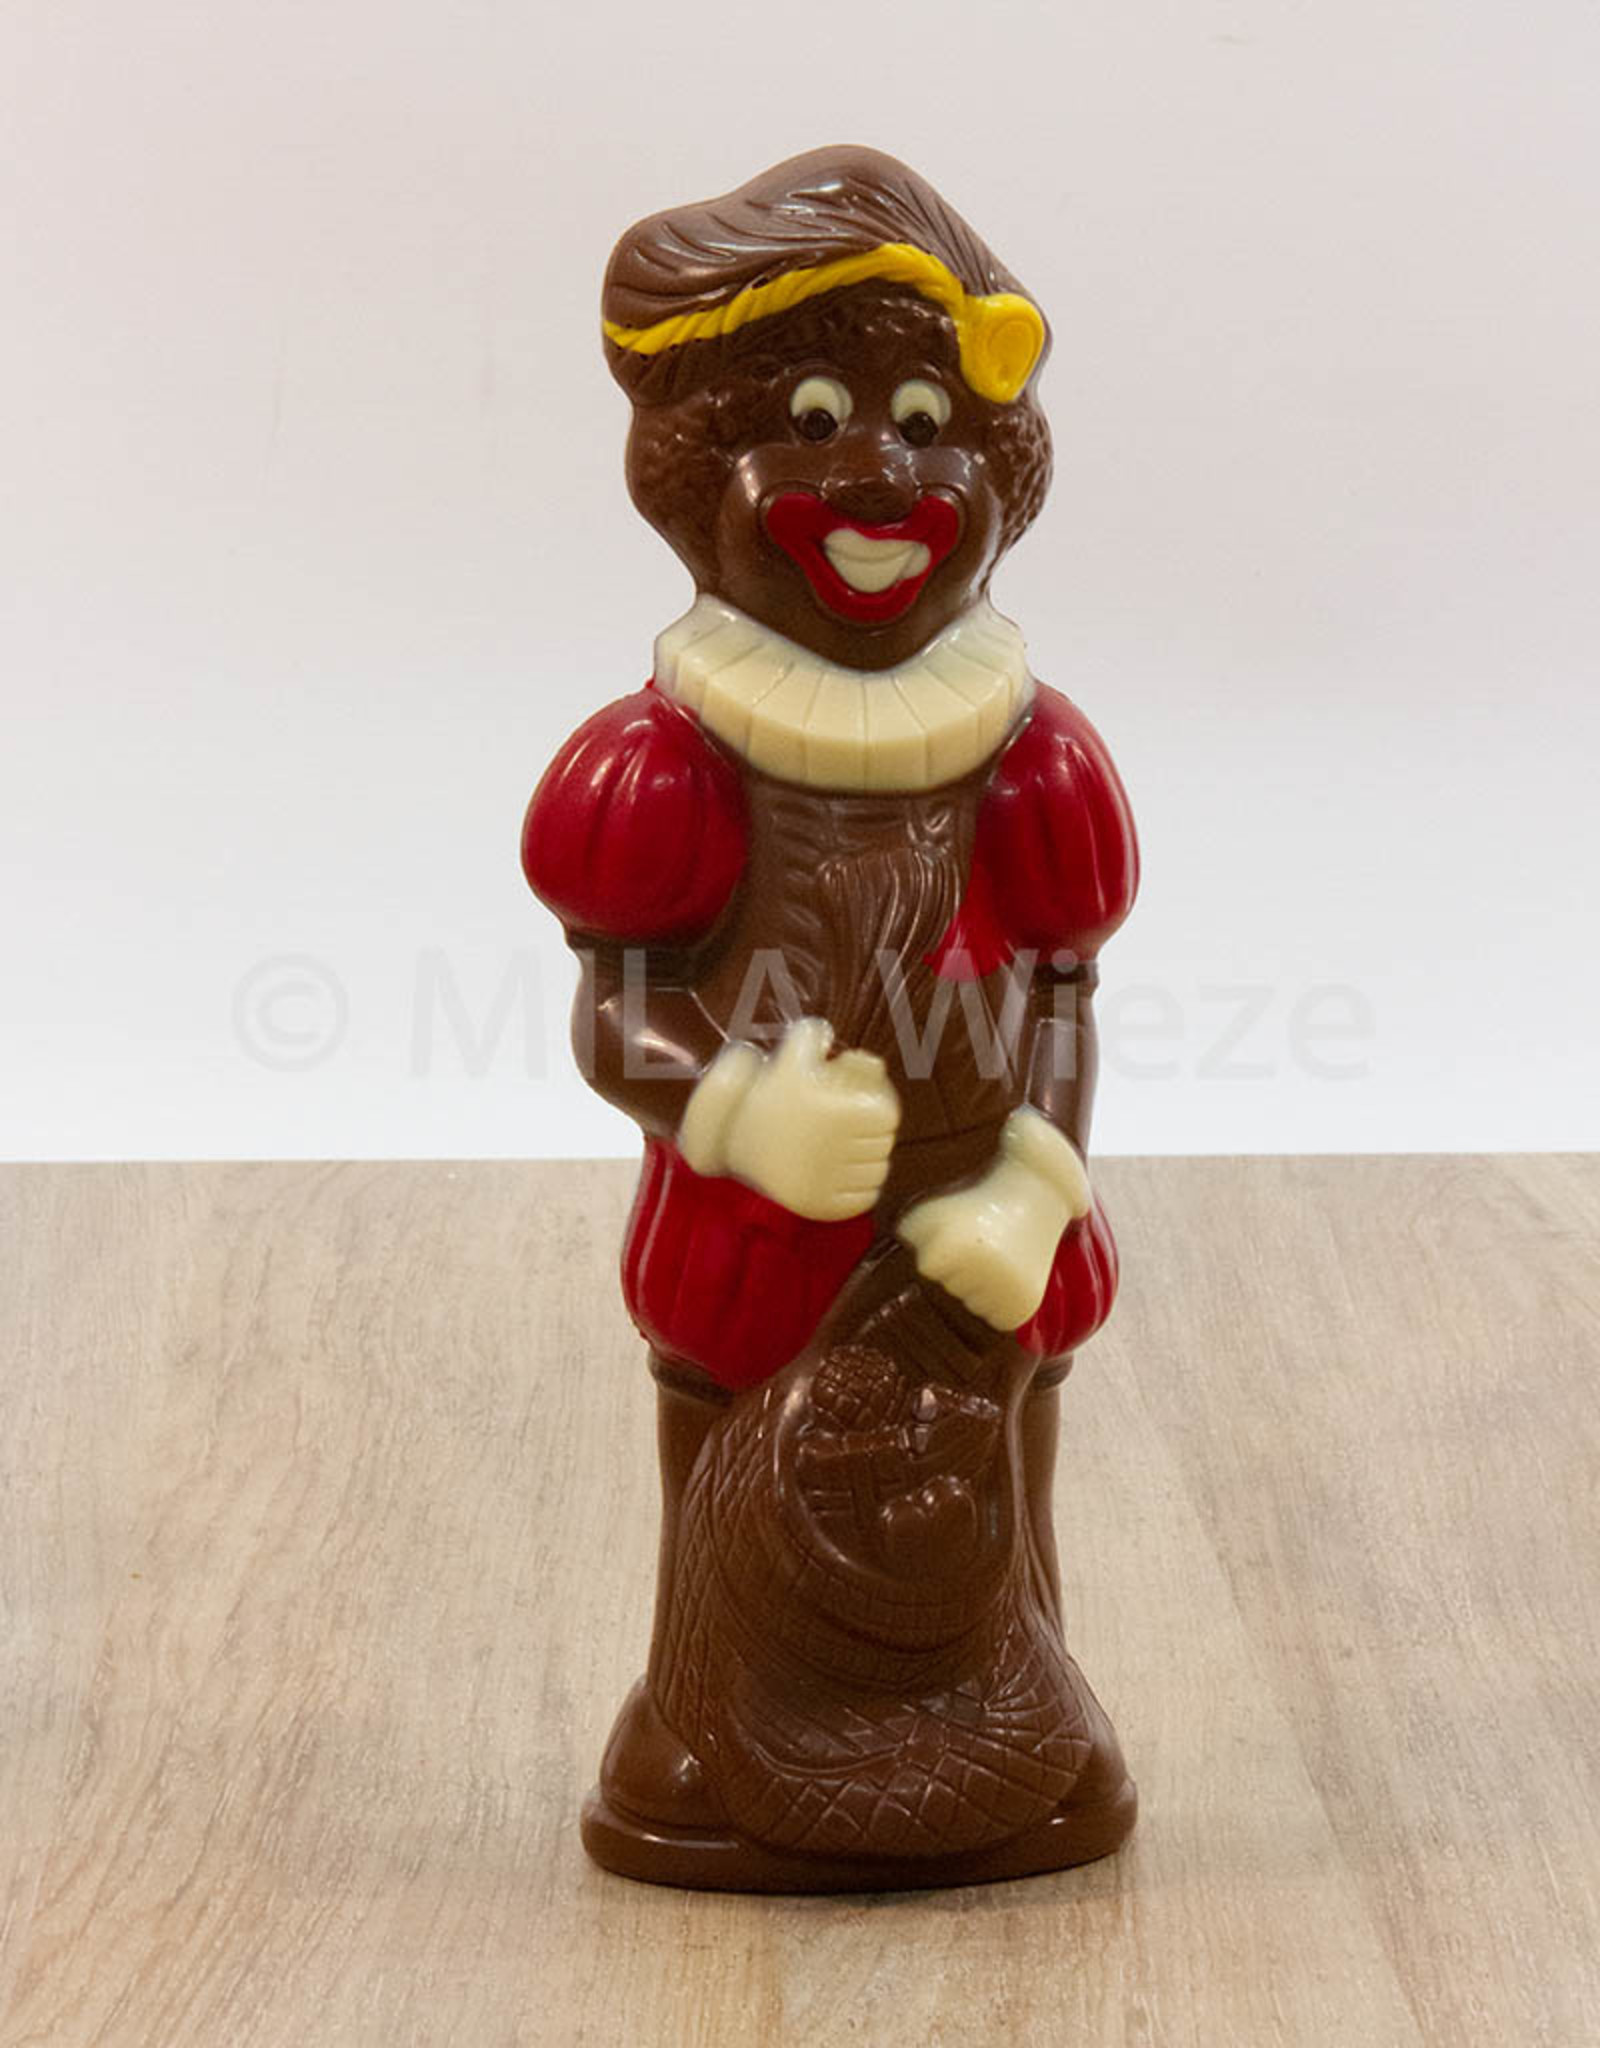 Lachende piet deco - 250 gr - 25 cm -melkchocolade